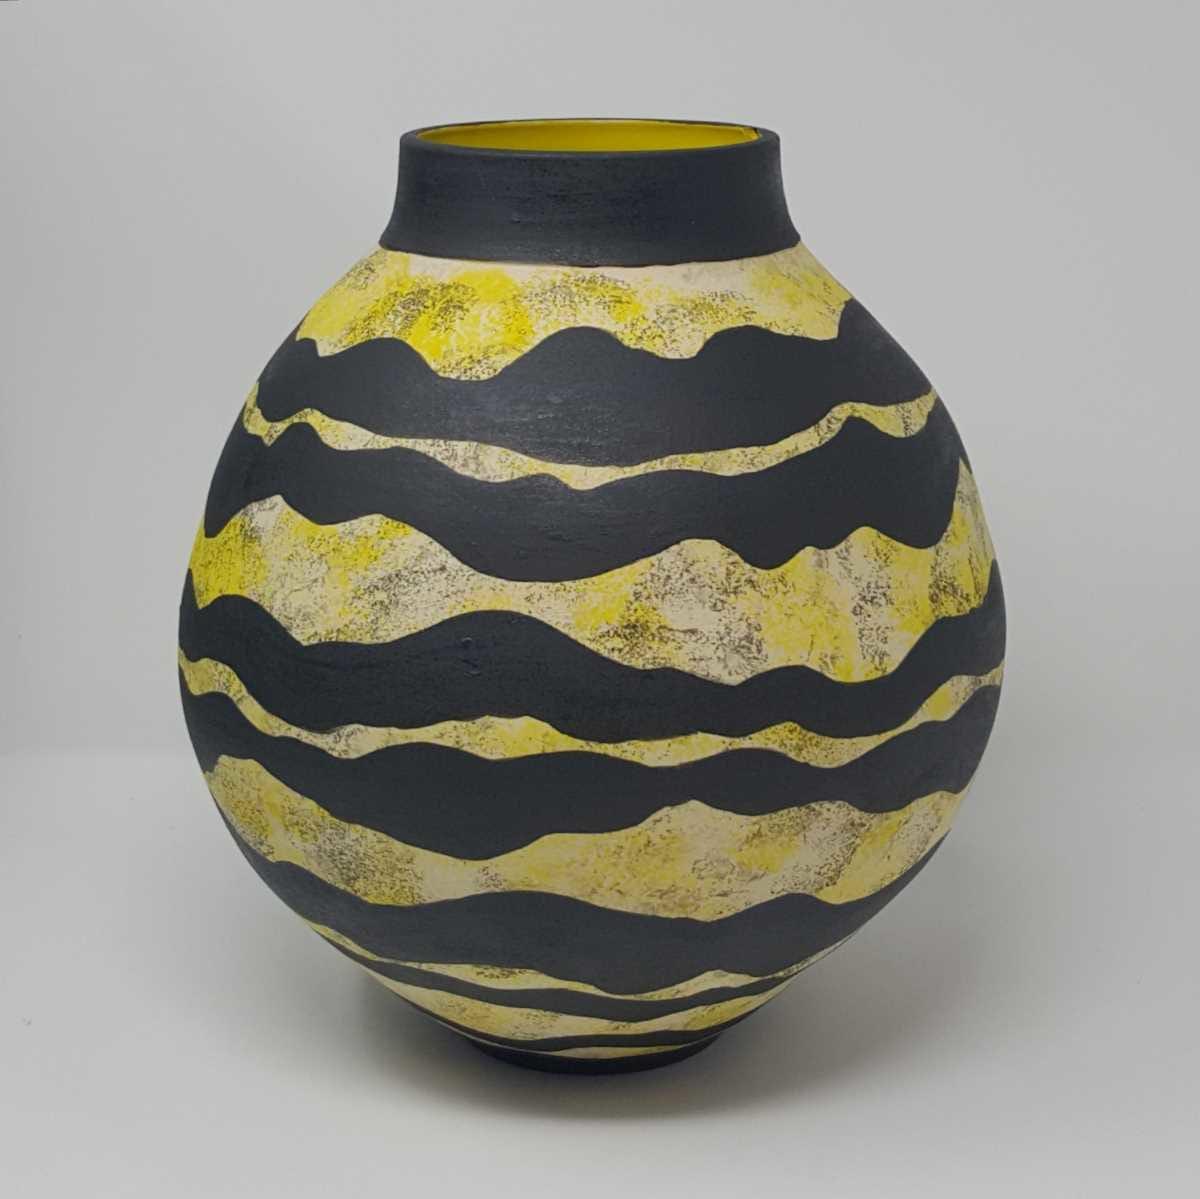 BRI100, Strata Moon Jar by Jane Bridger